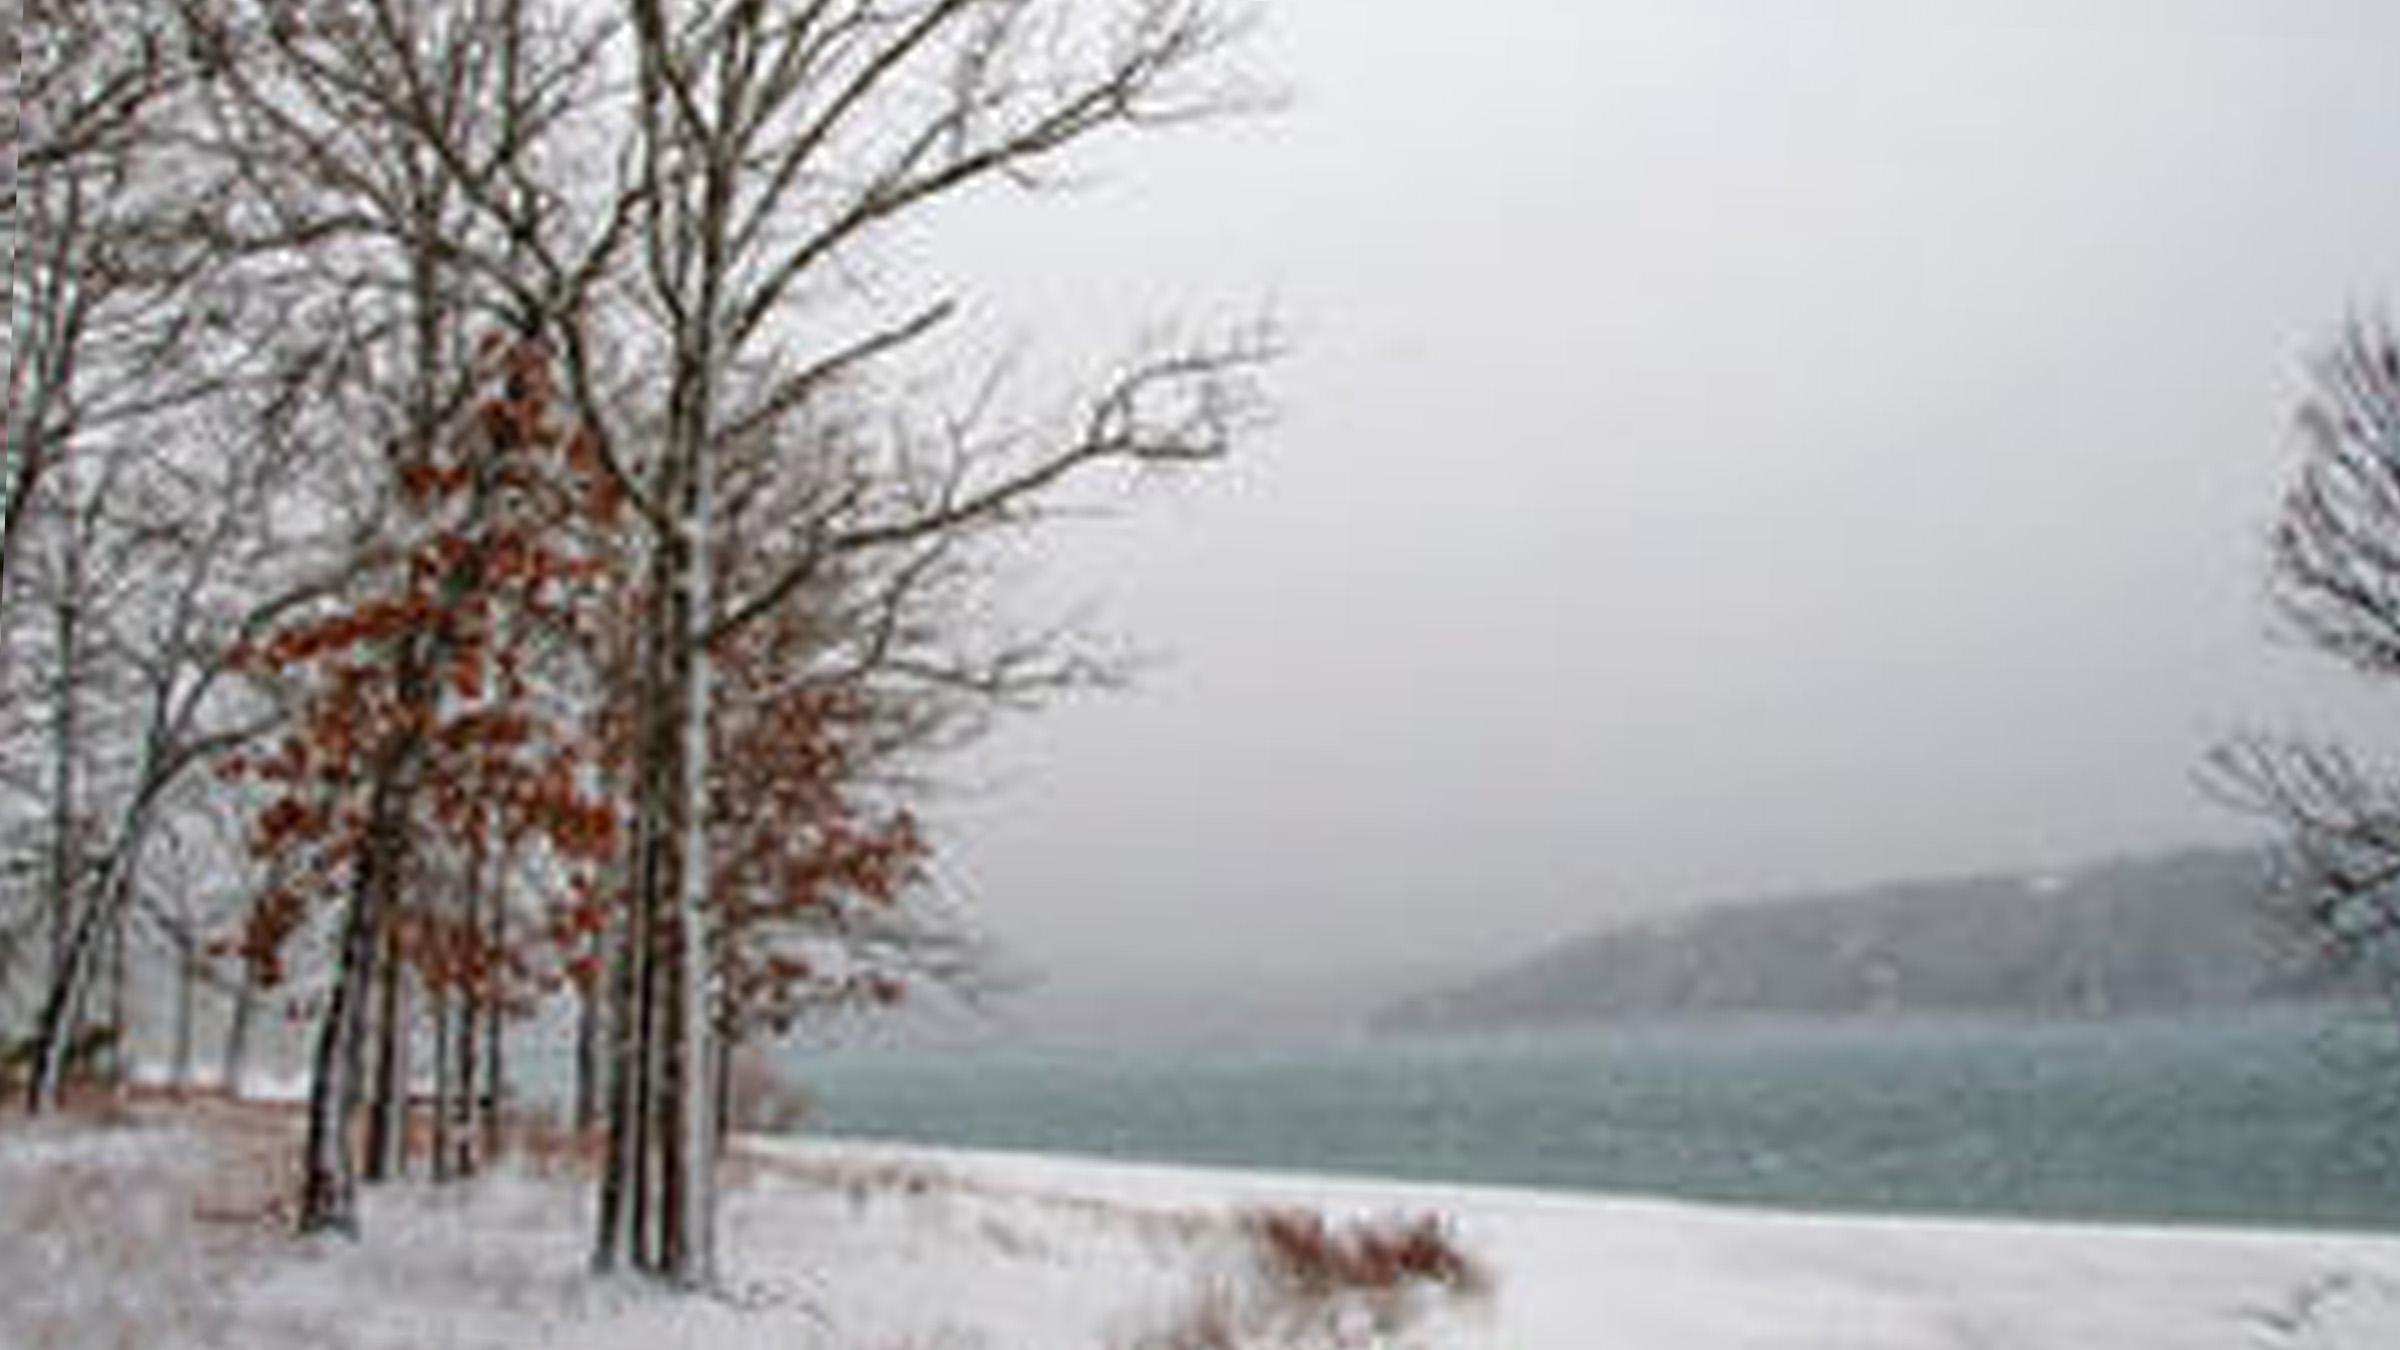 Winter at Joe Bald Park